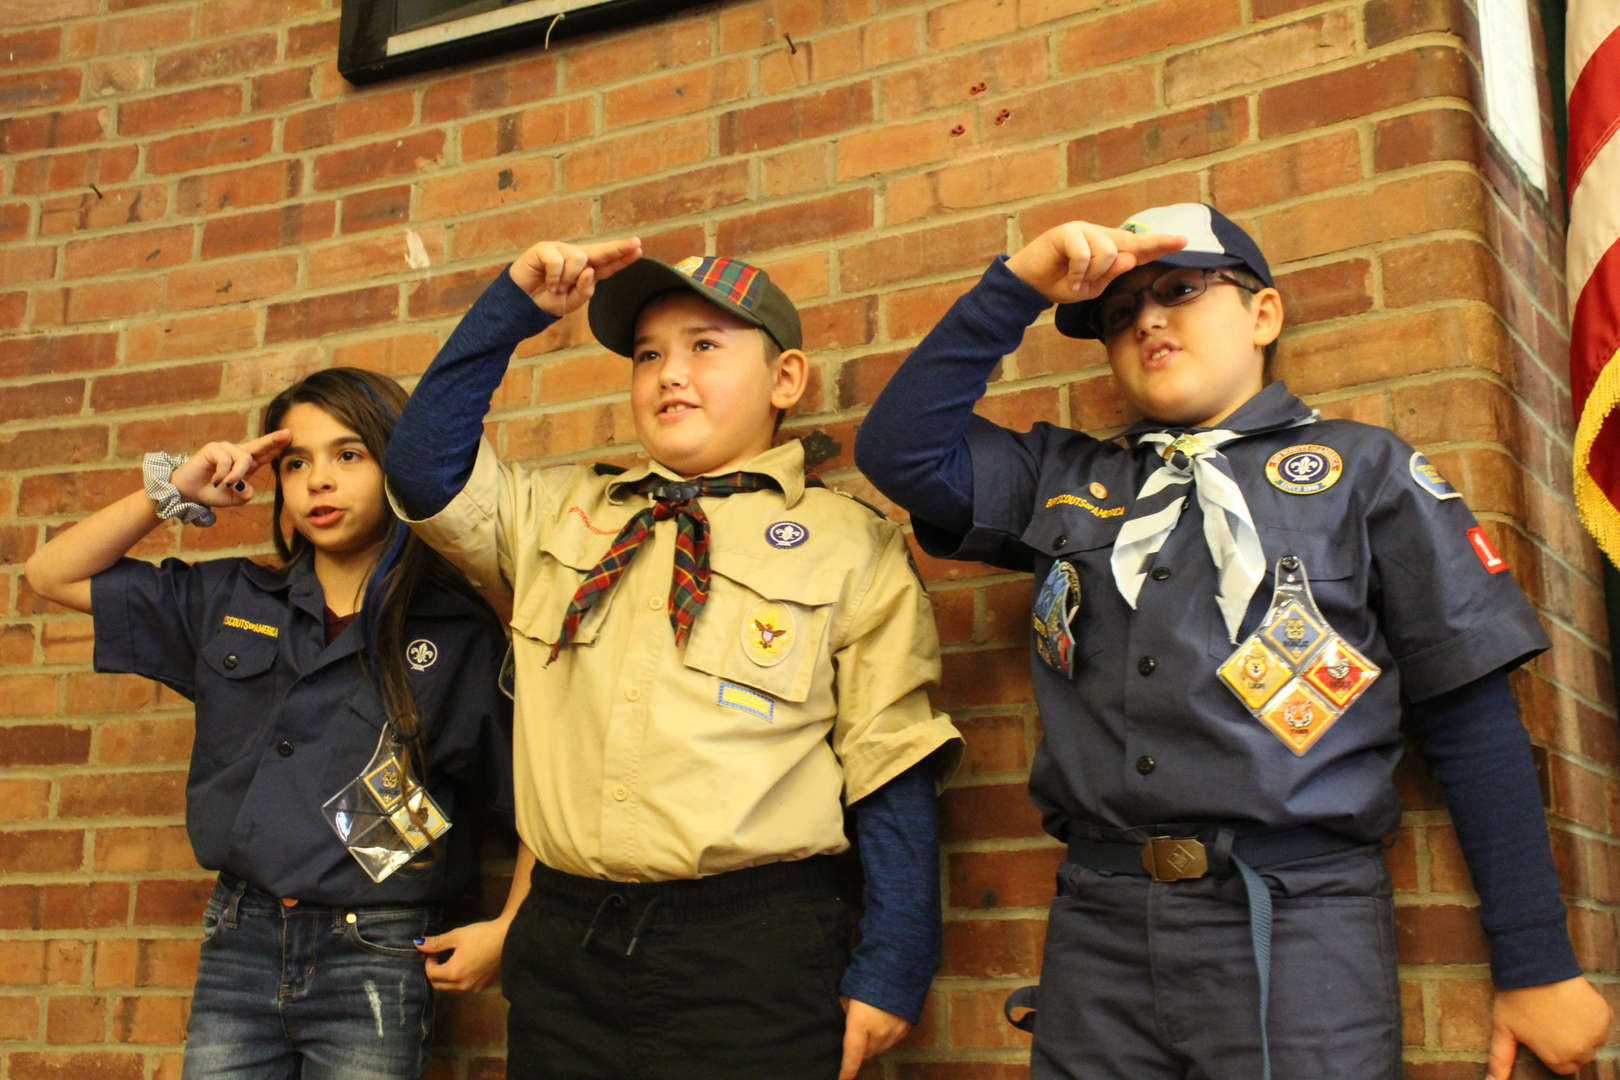 Boy Scouts salute flag